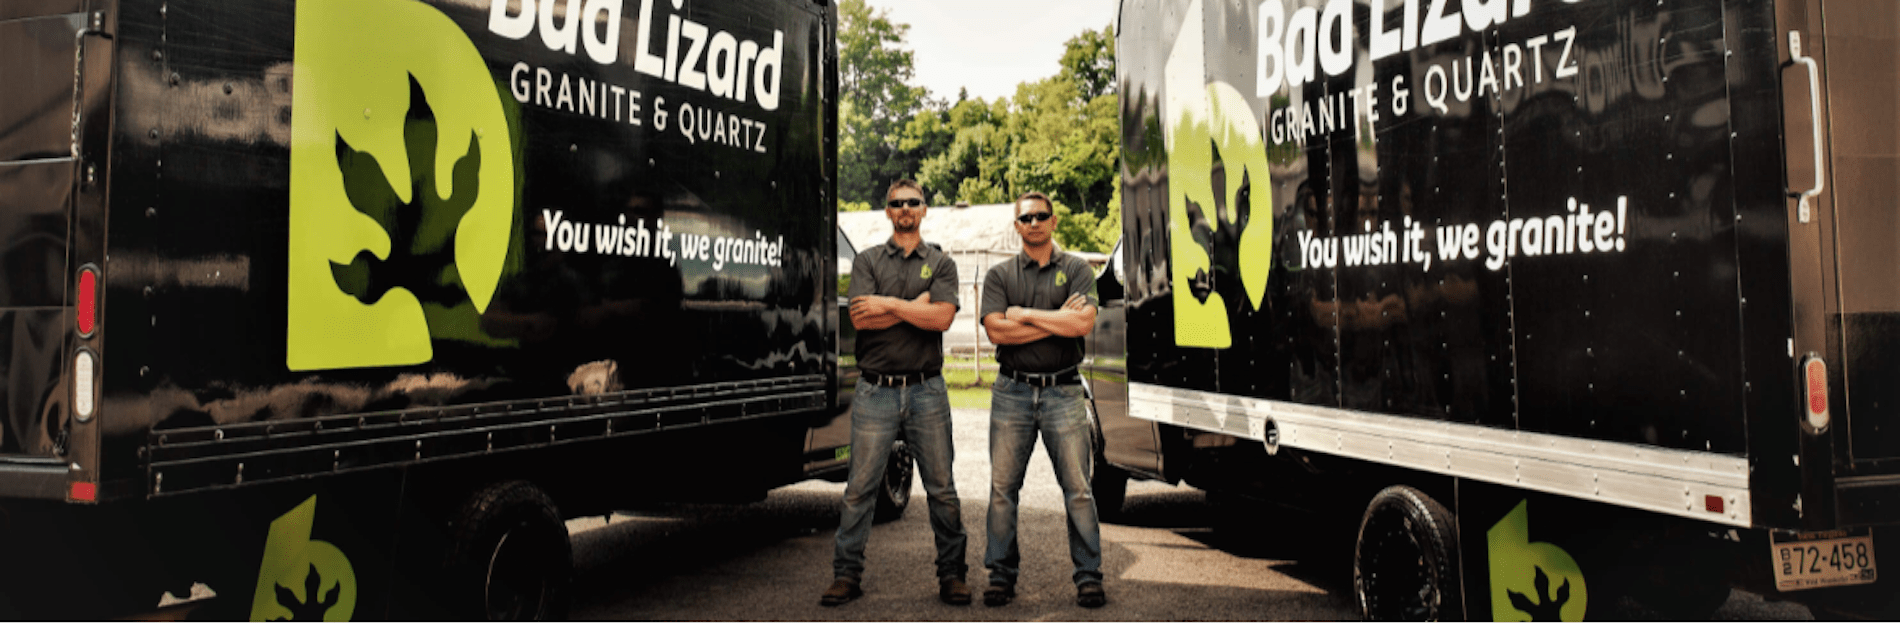 Bad Lizard Home Show